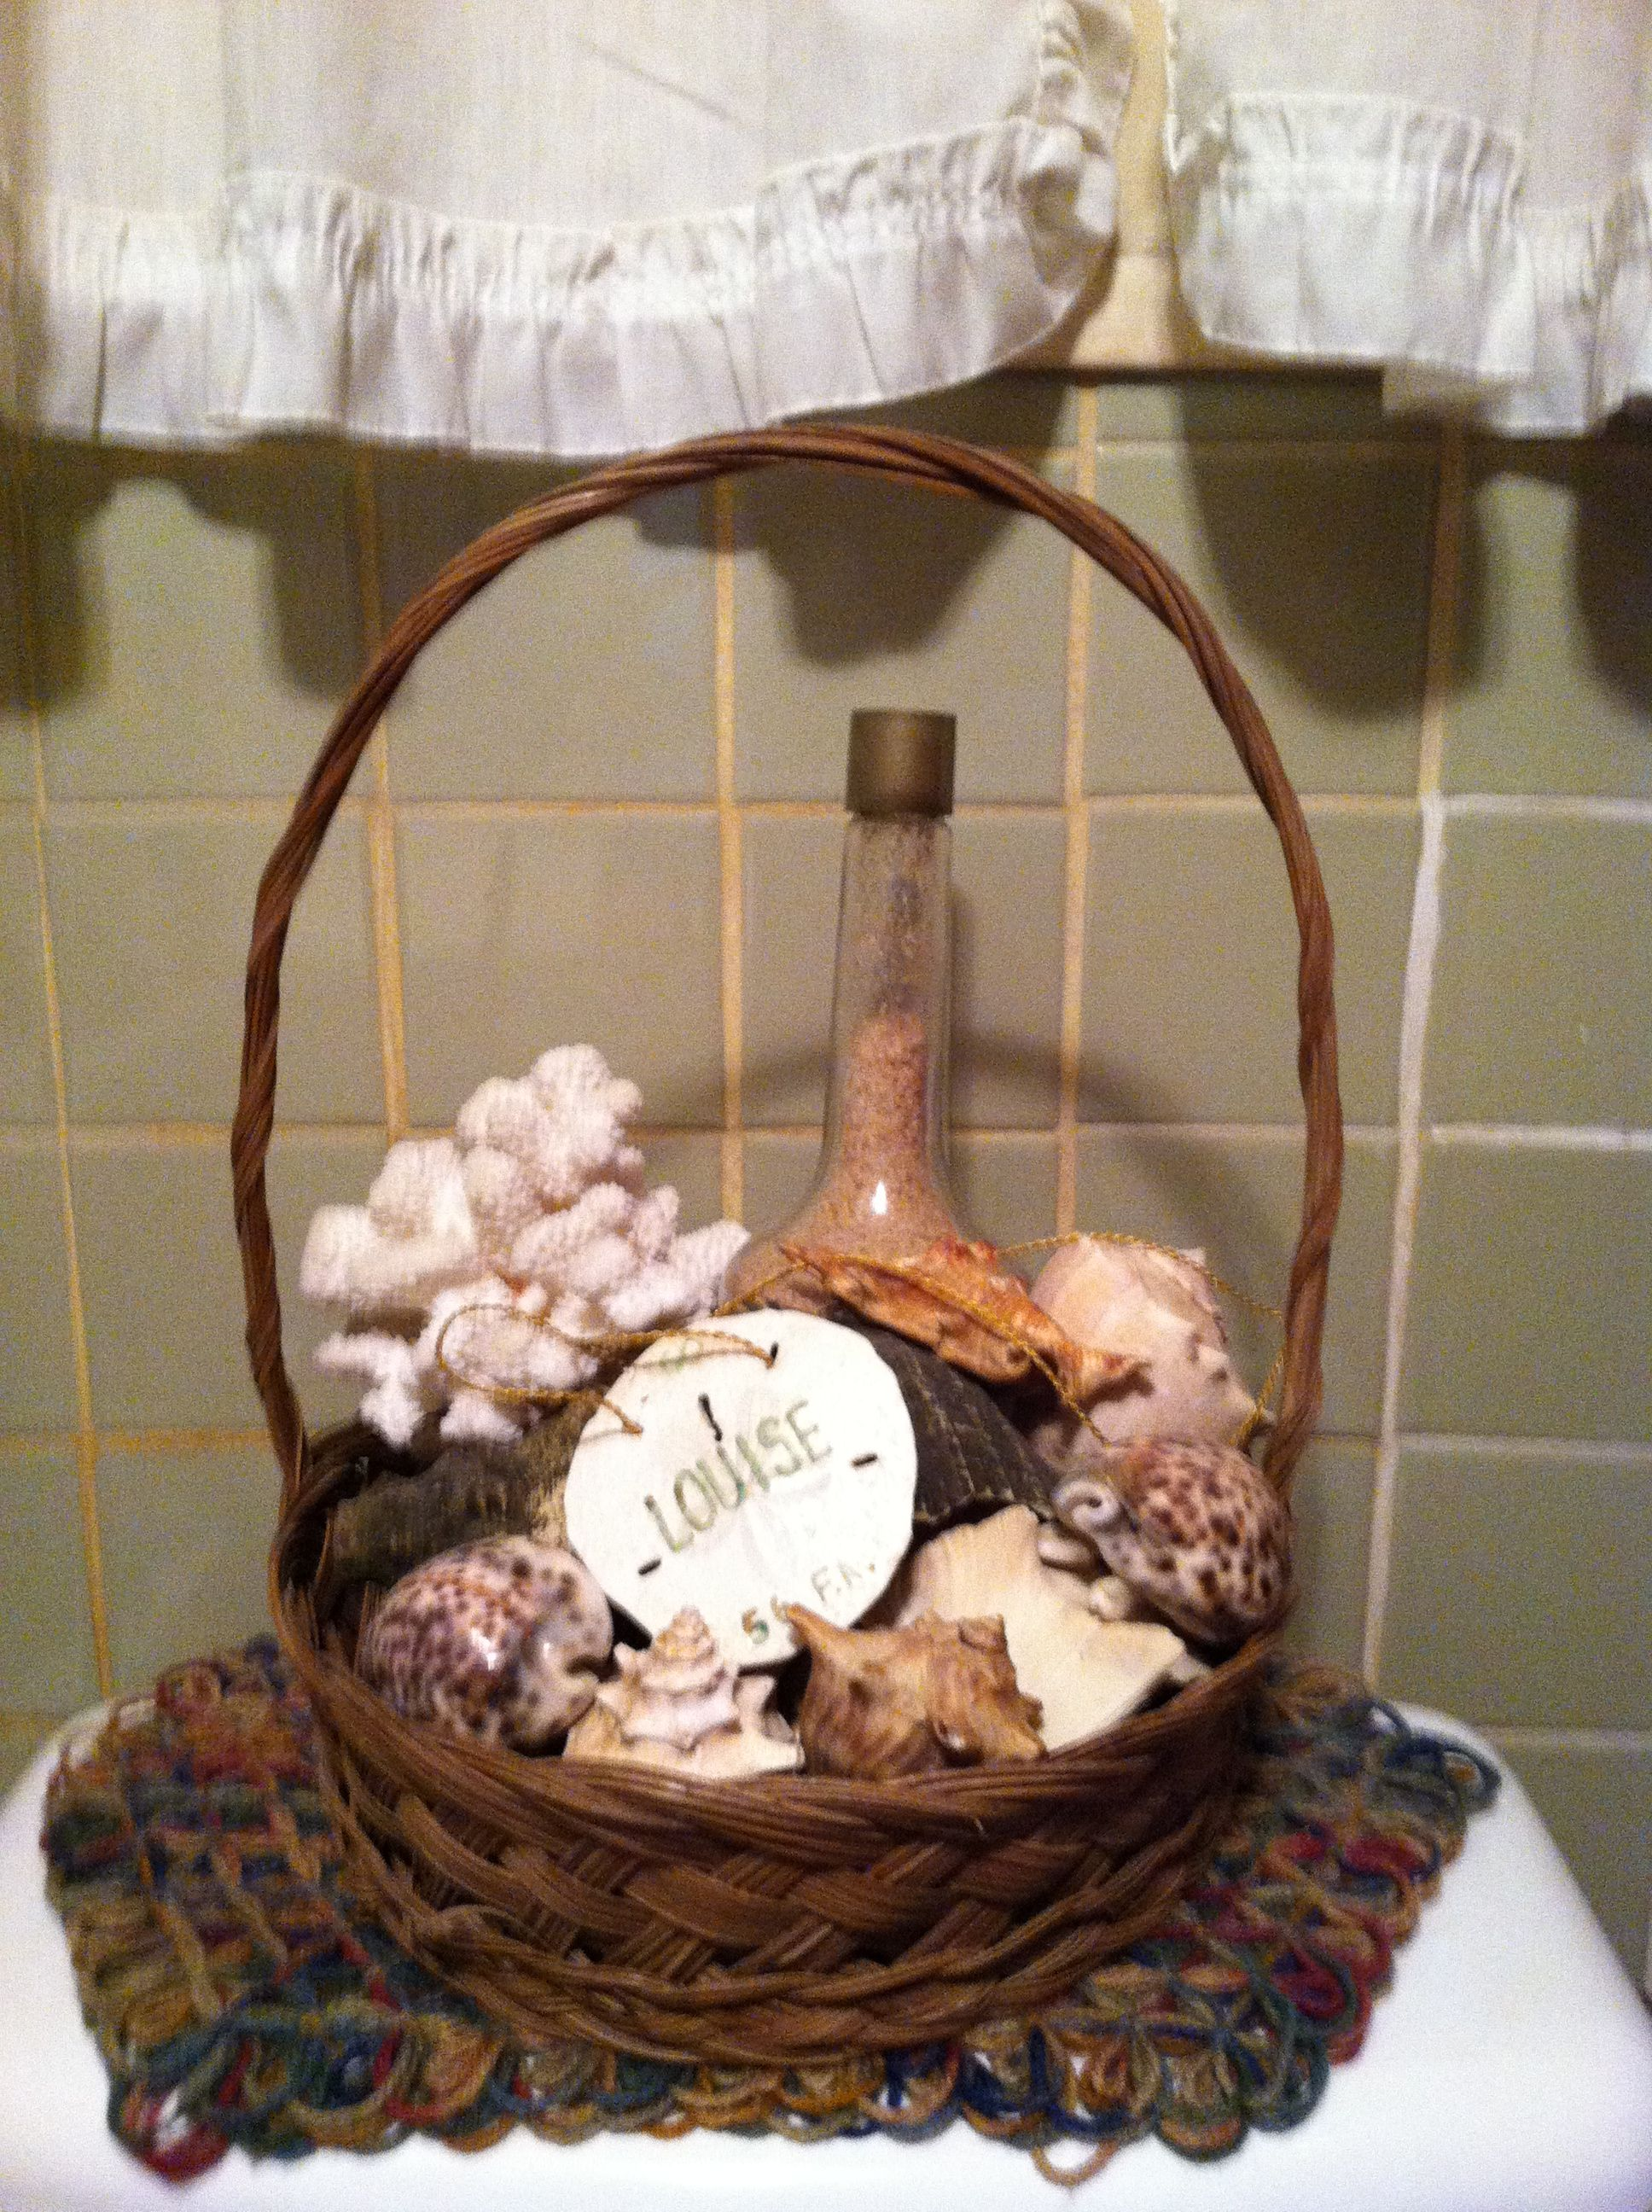 Bathroom basket of sea shells